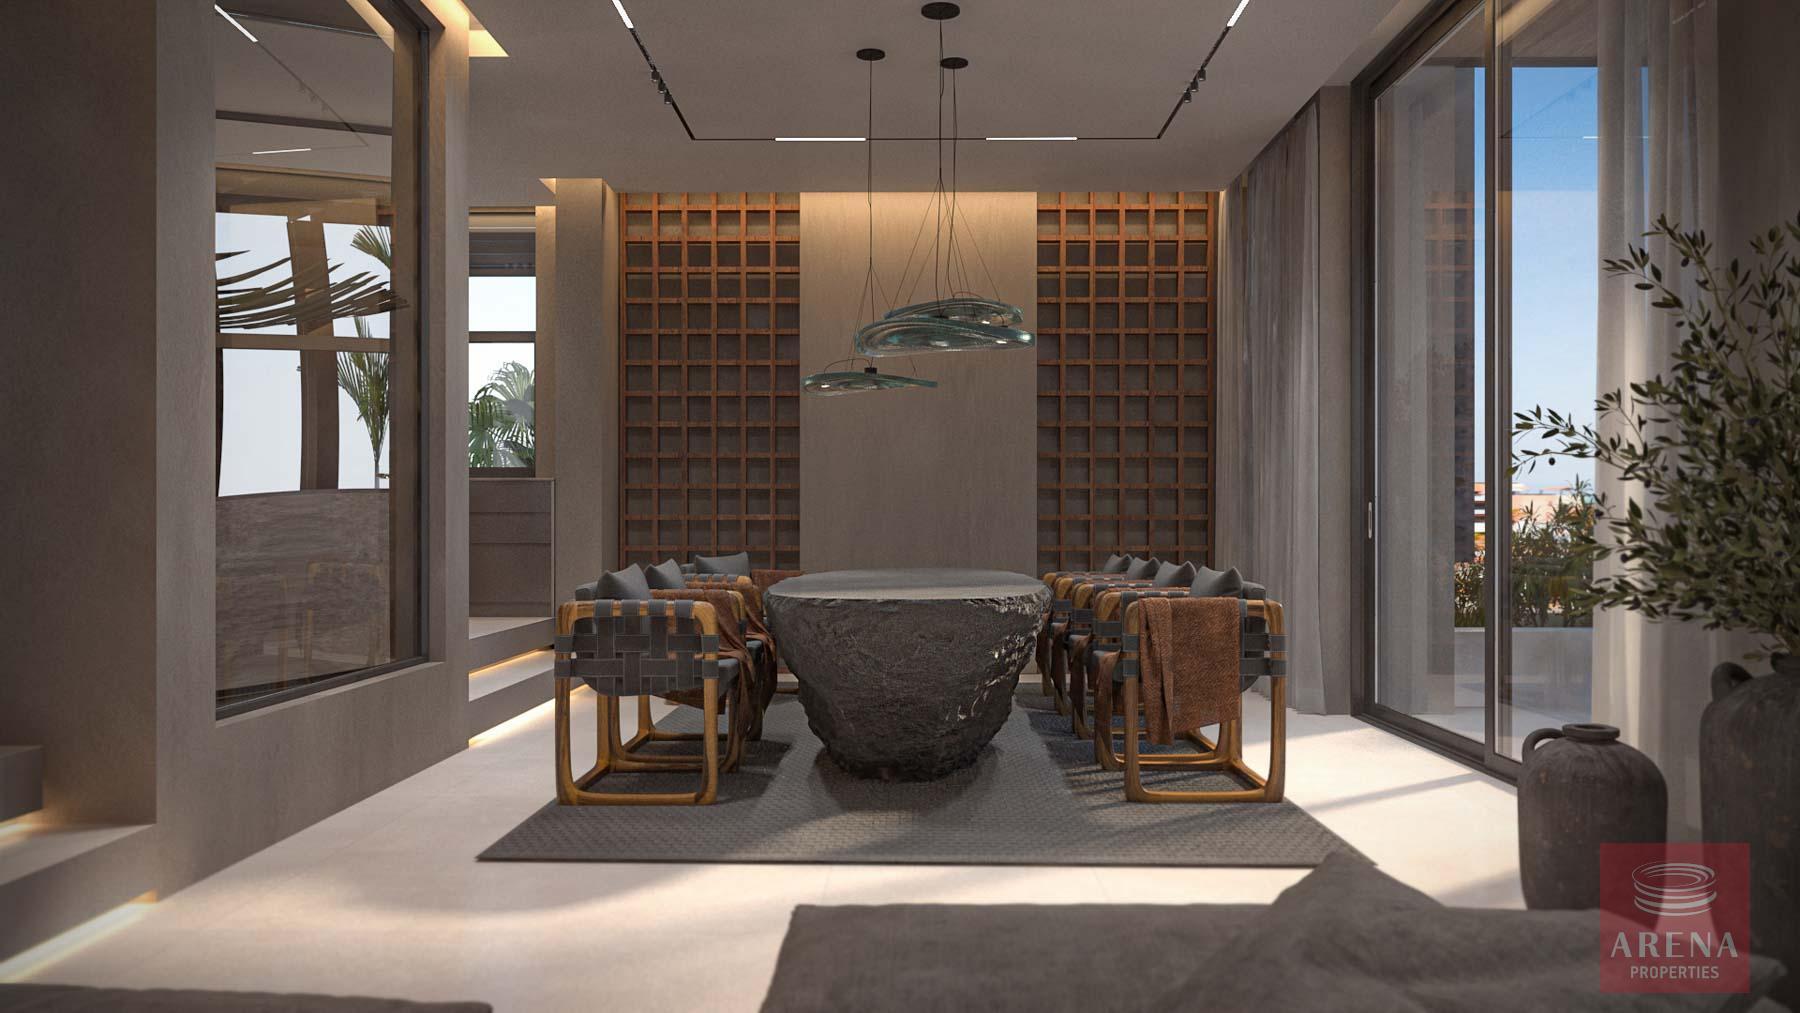 4 Bed Seafron Villa in Kapparis - dining area